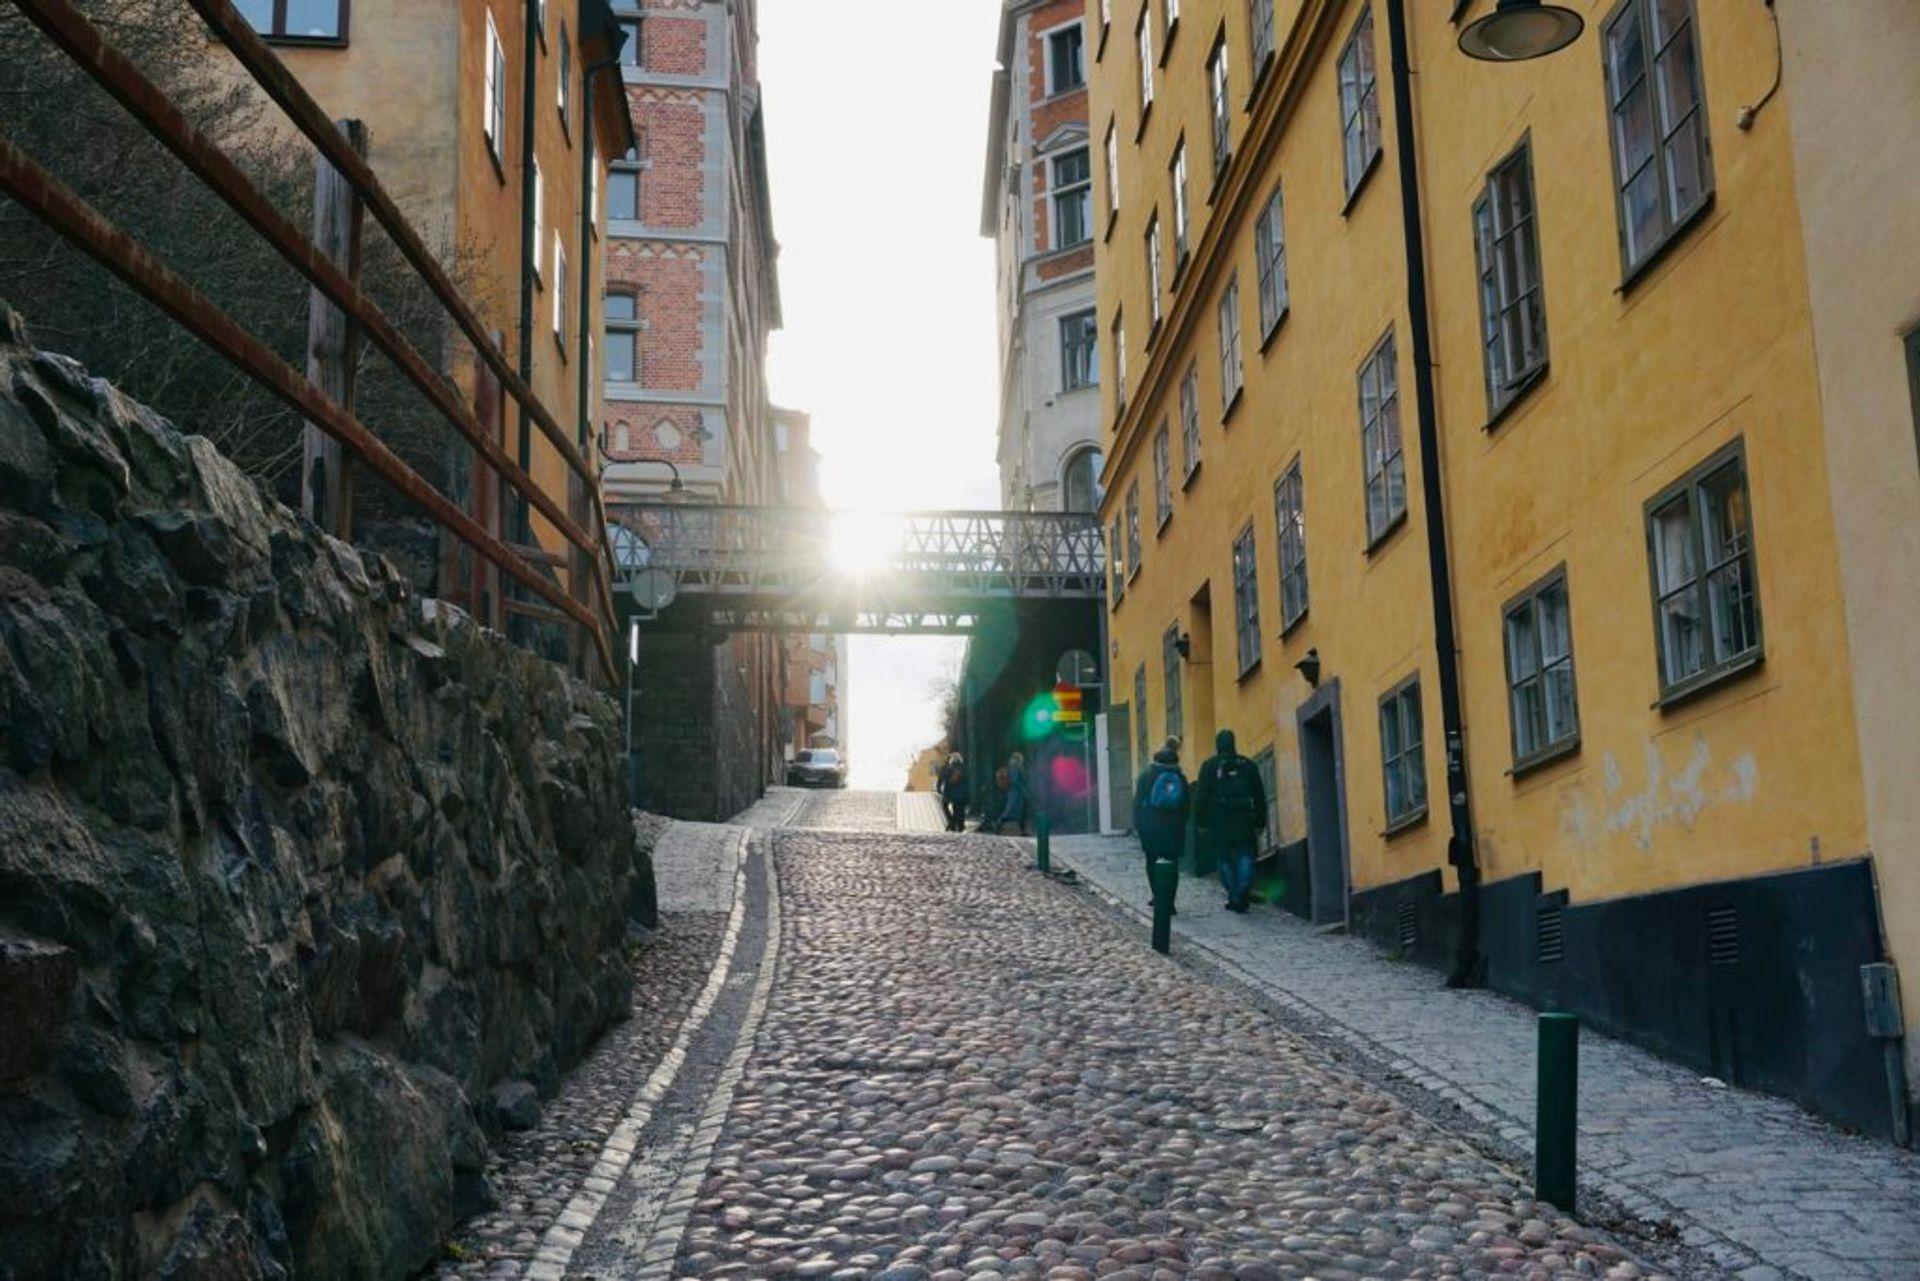 People walking along a cobbled stree.